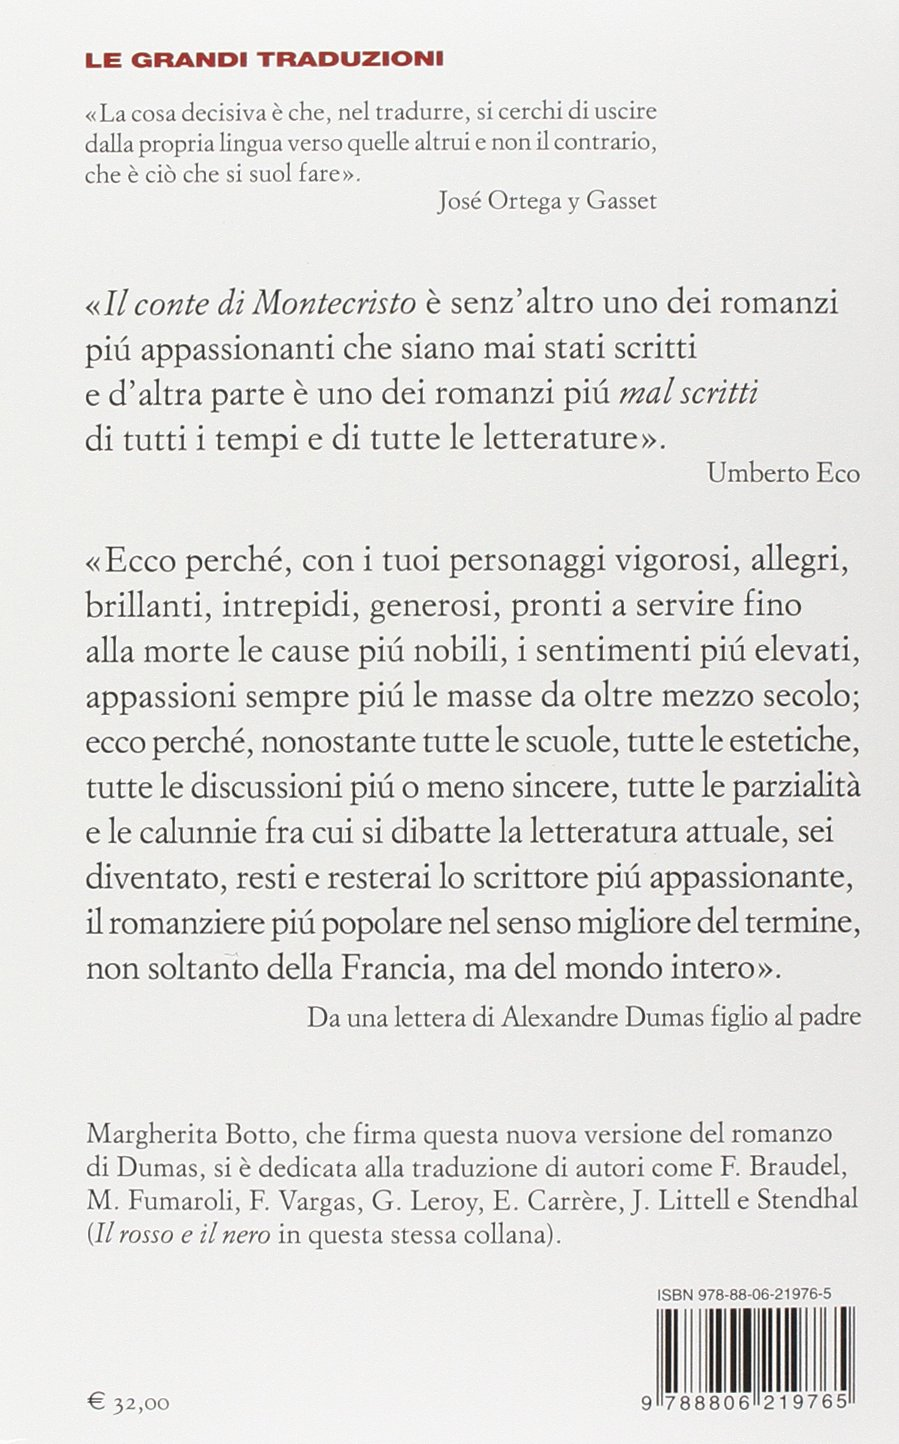 Il conte di Montecristo (Supercoralli): Amazon.es: Alexandre Dumas, M. Botto: Libros en idiomas extranjeros